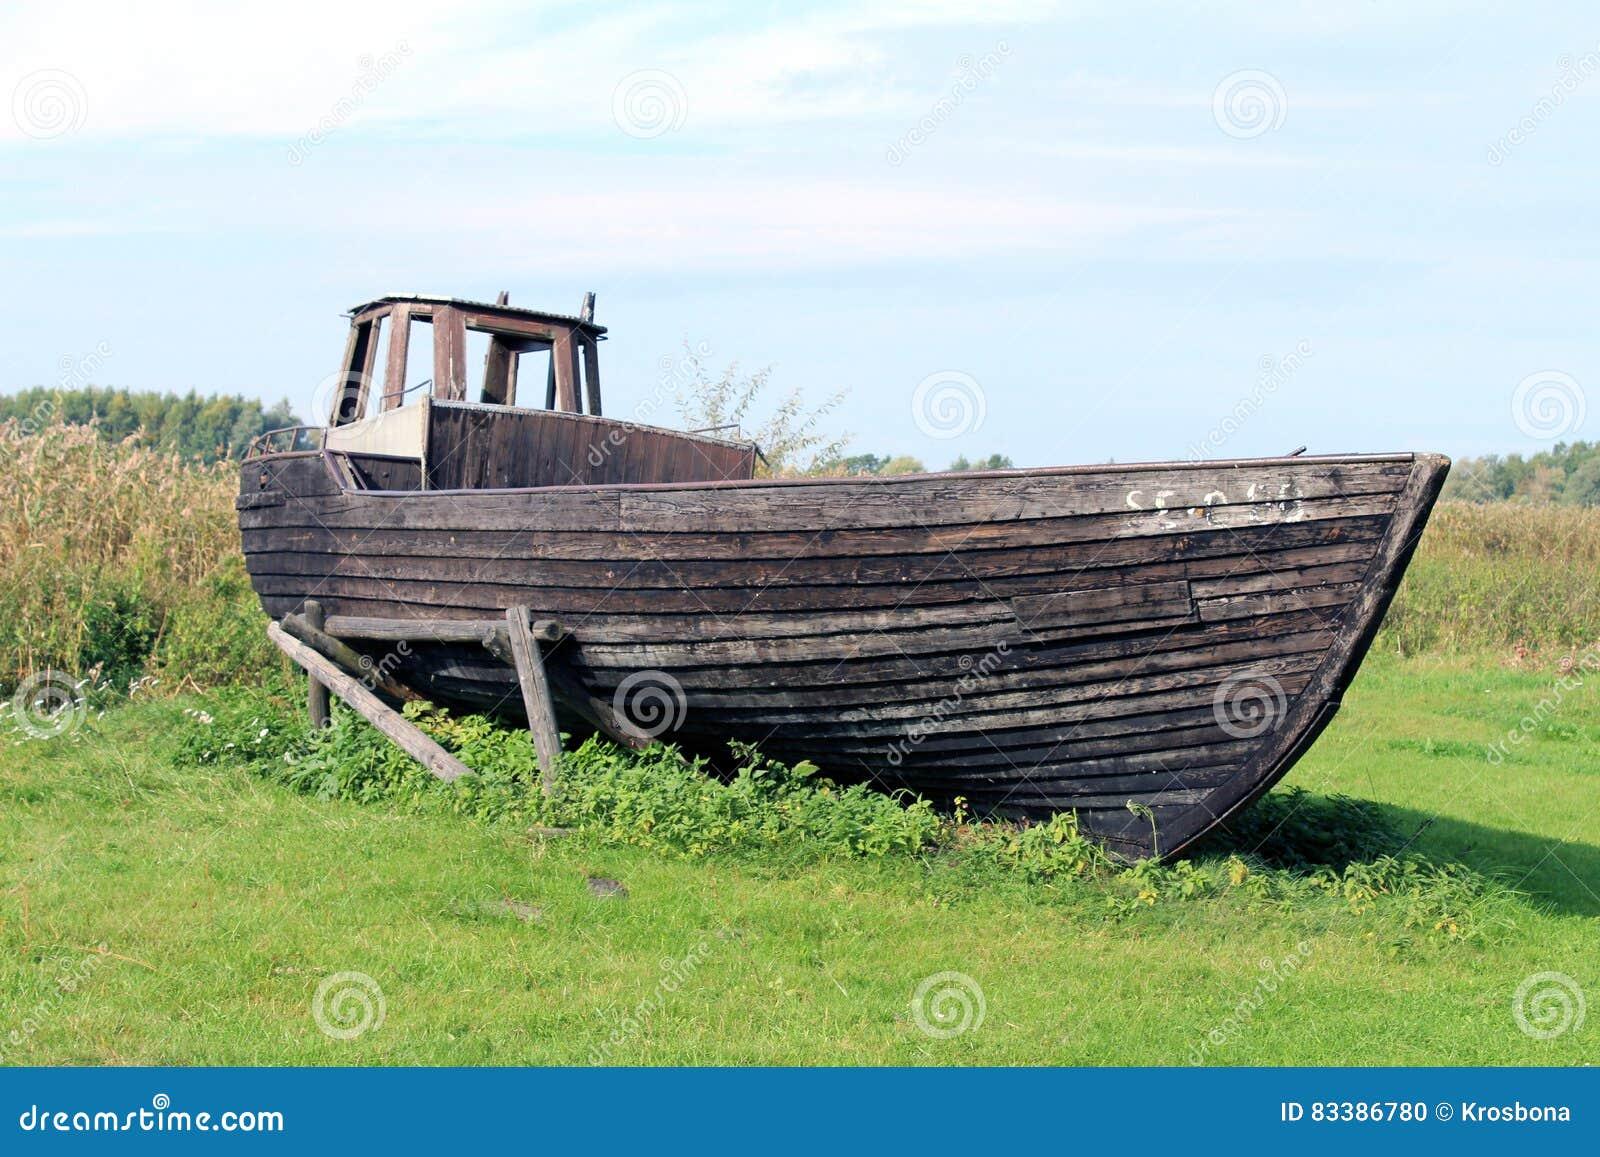 Old fishing wood boat